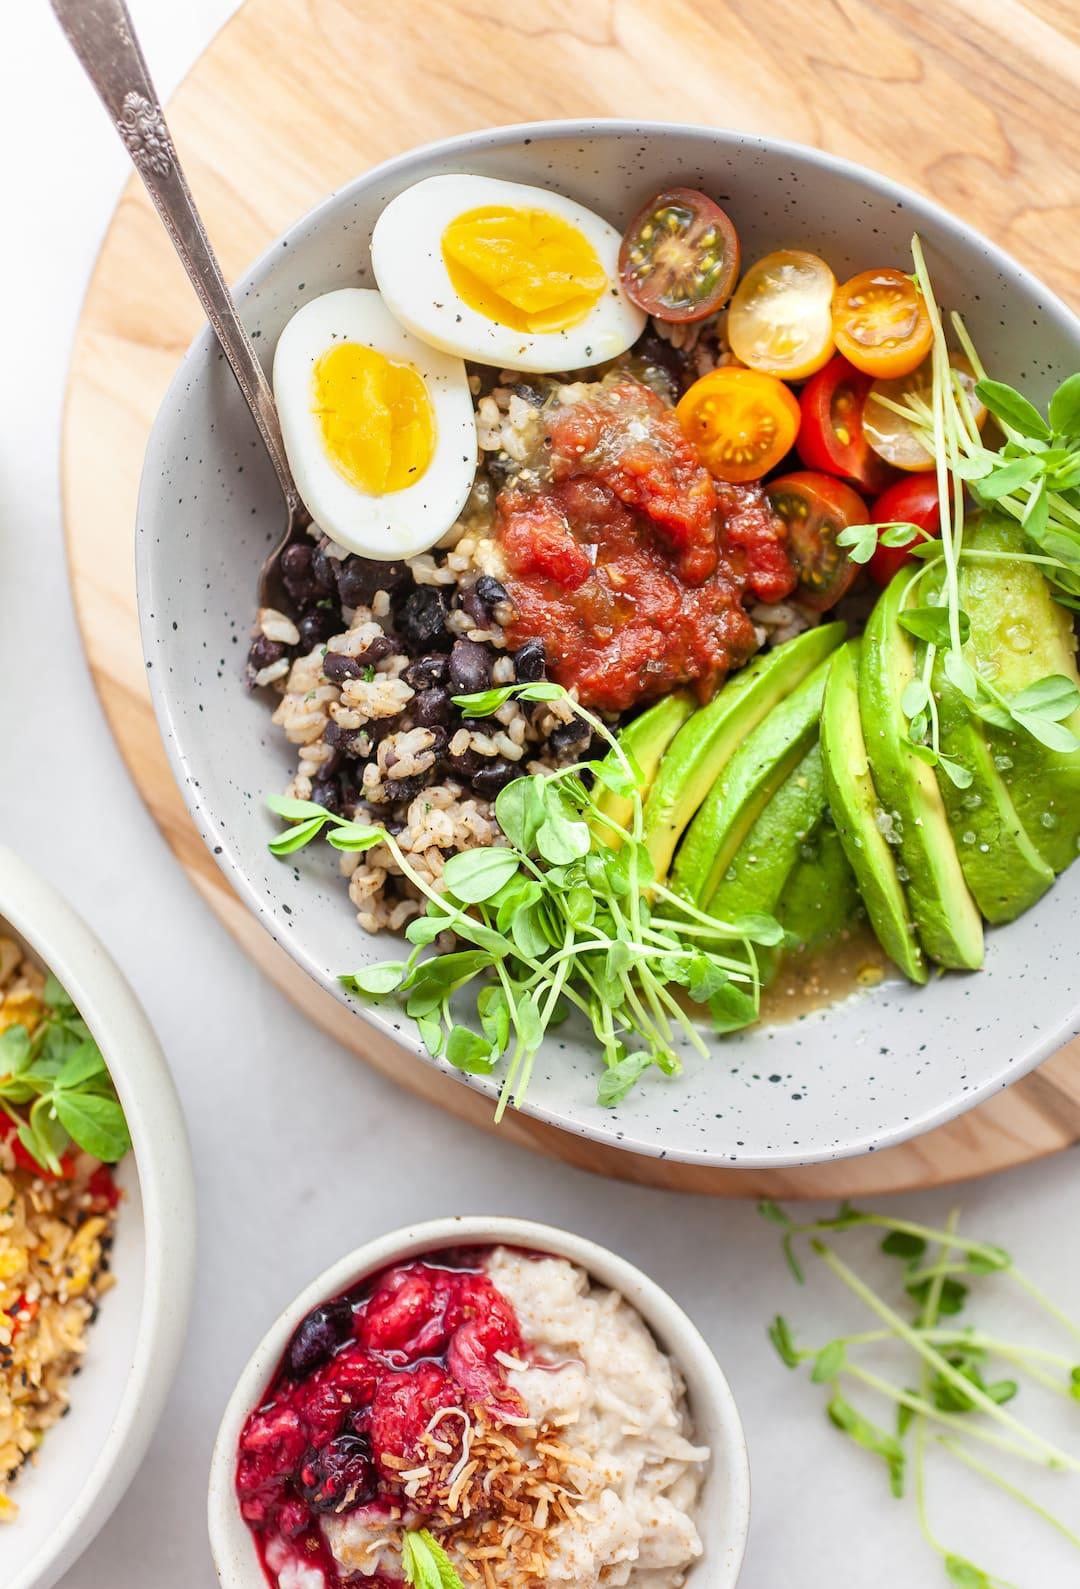 5 Simple, Easy, & Tasty Rice Recipe Ideas - dairy free, gluten free,